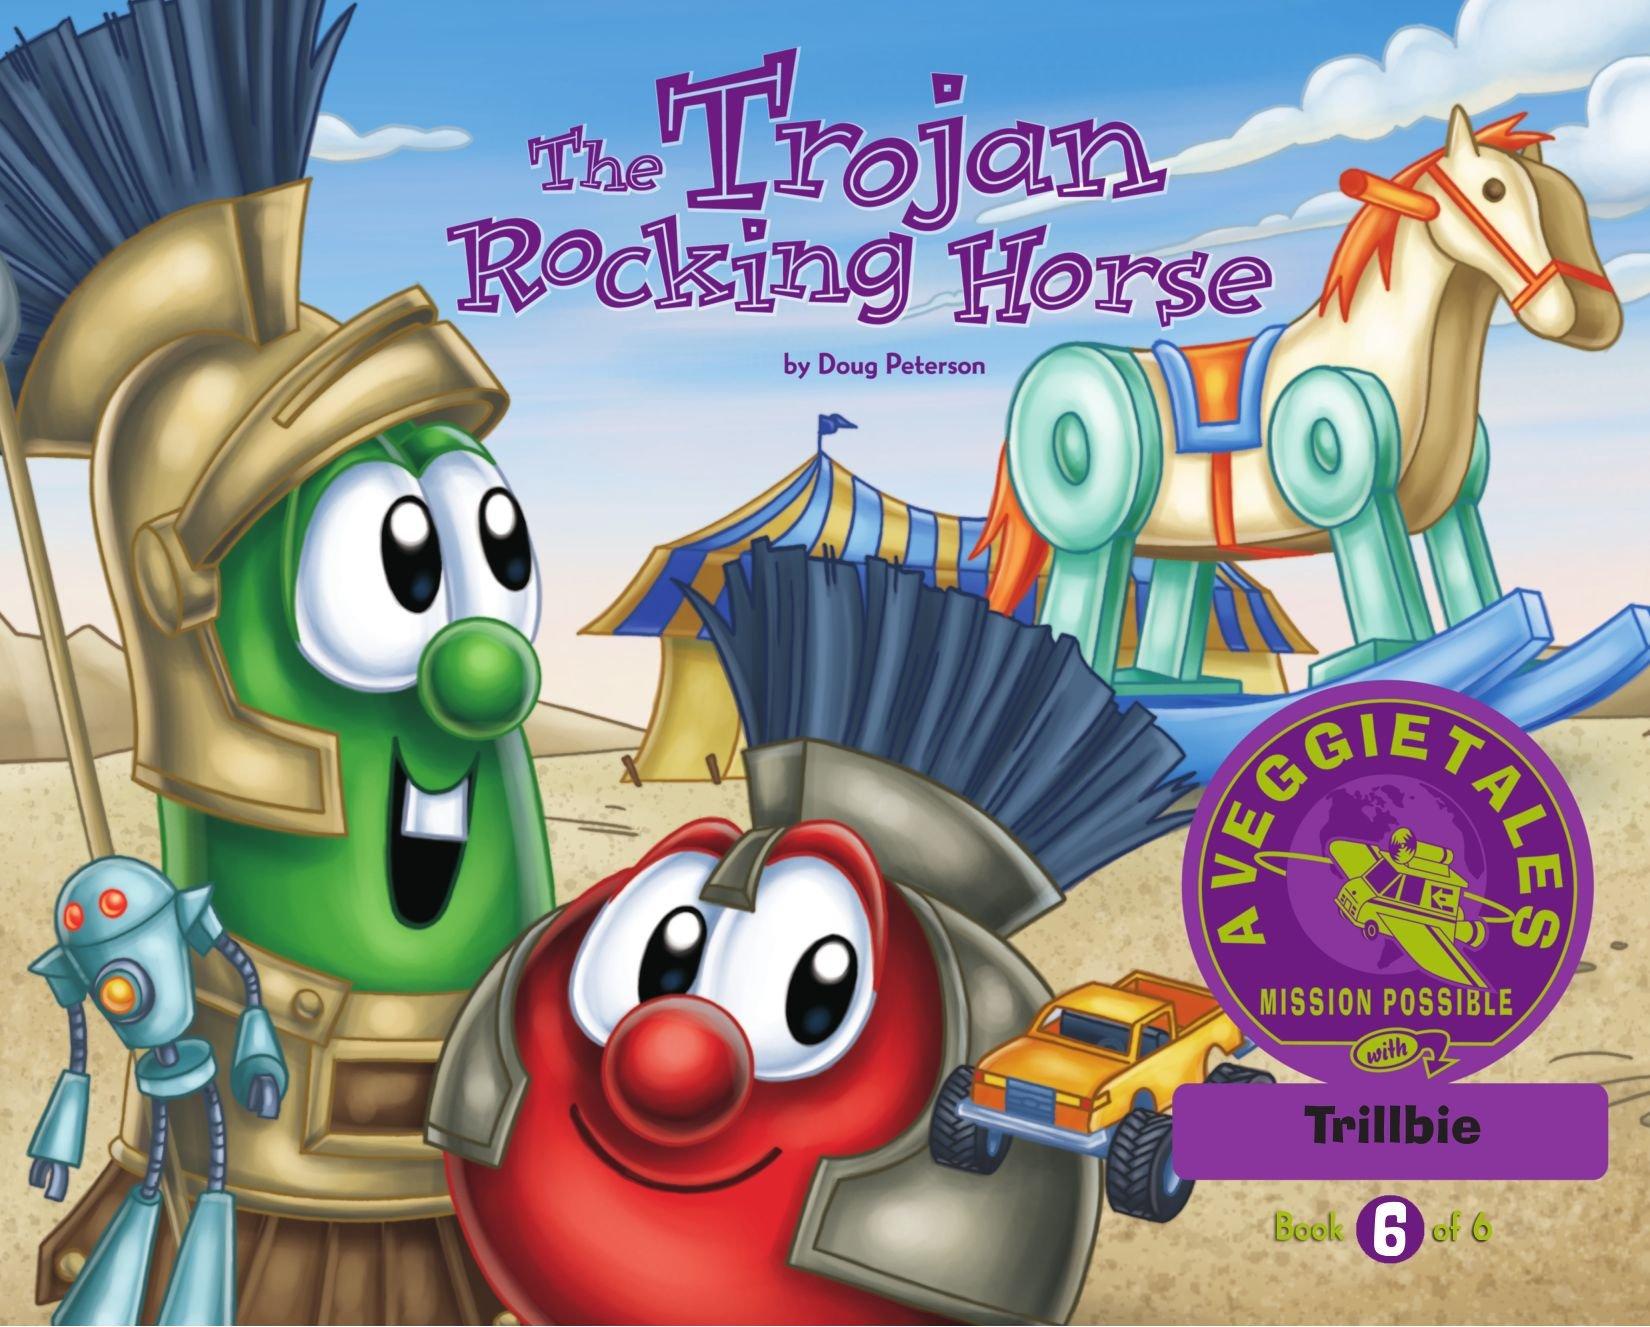 The Trojan Rocking Horse - VeggieTales Mission Possible Adventure Series #6: Personalized for Trillbie (Girl) pdf epub